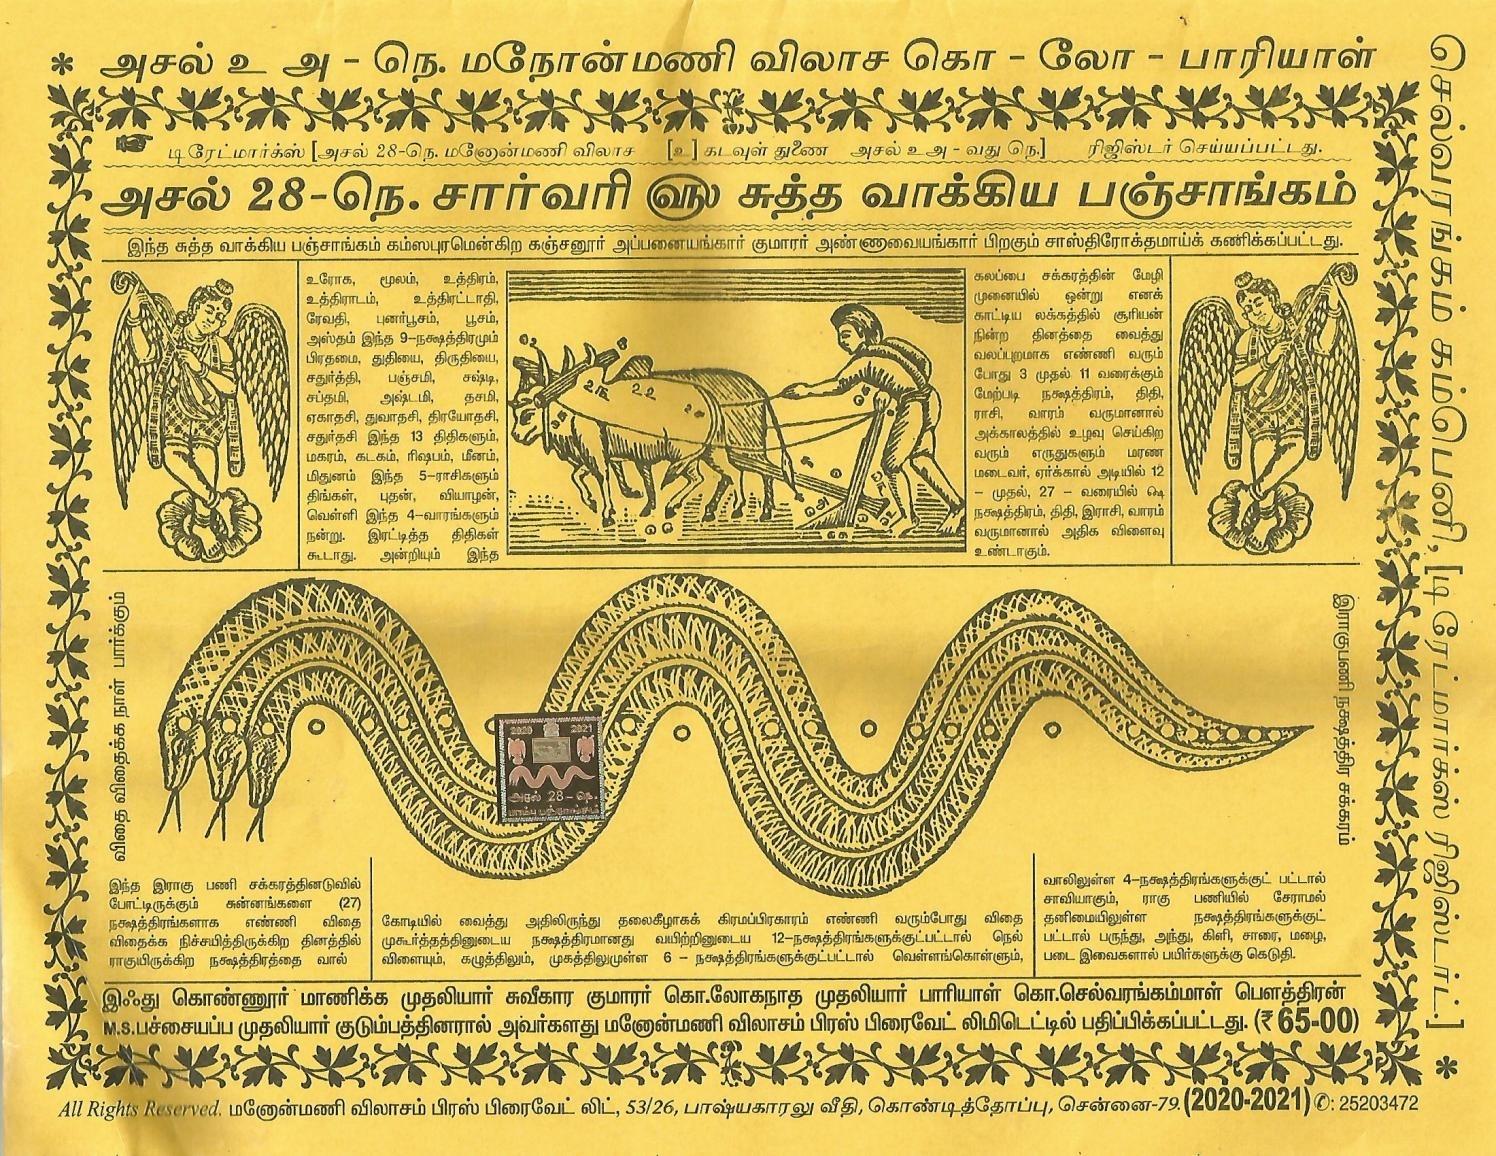 Saarvari Varusha Tamil Pambu Panchangam 2020-21Sivakumar